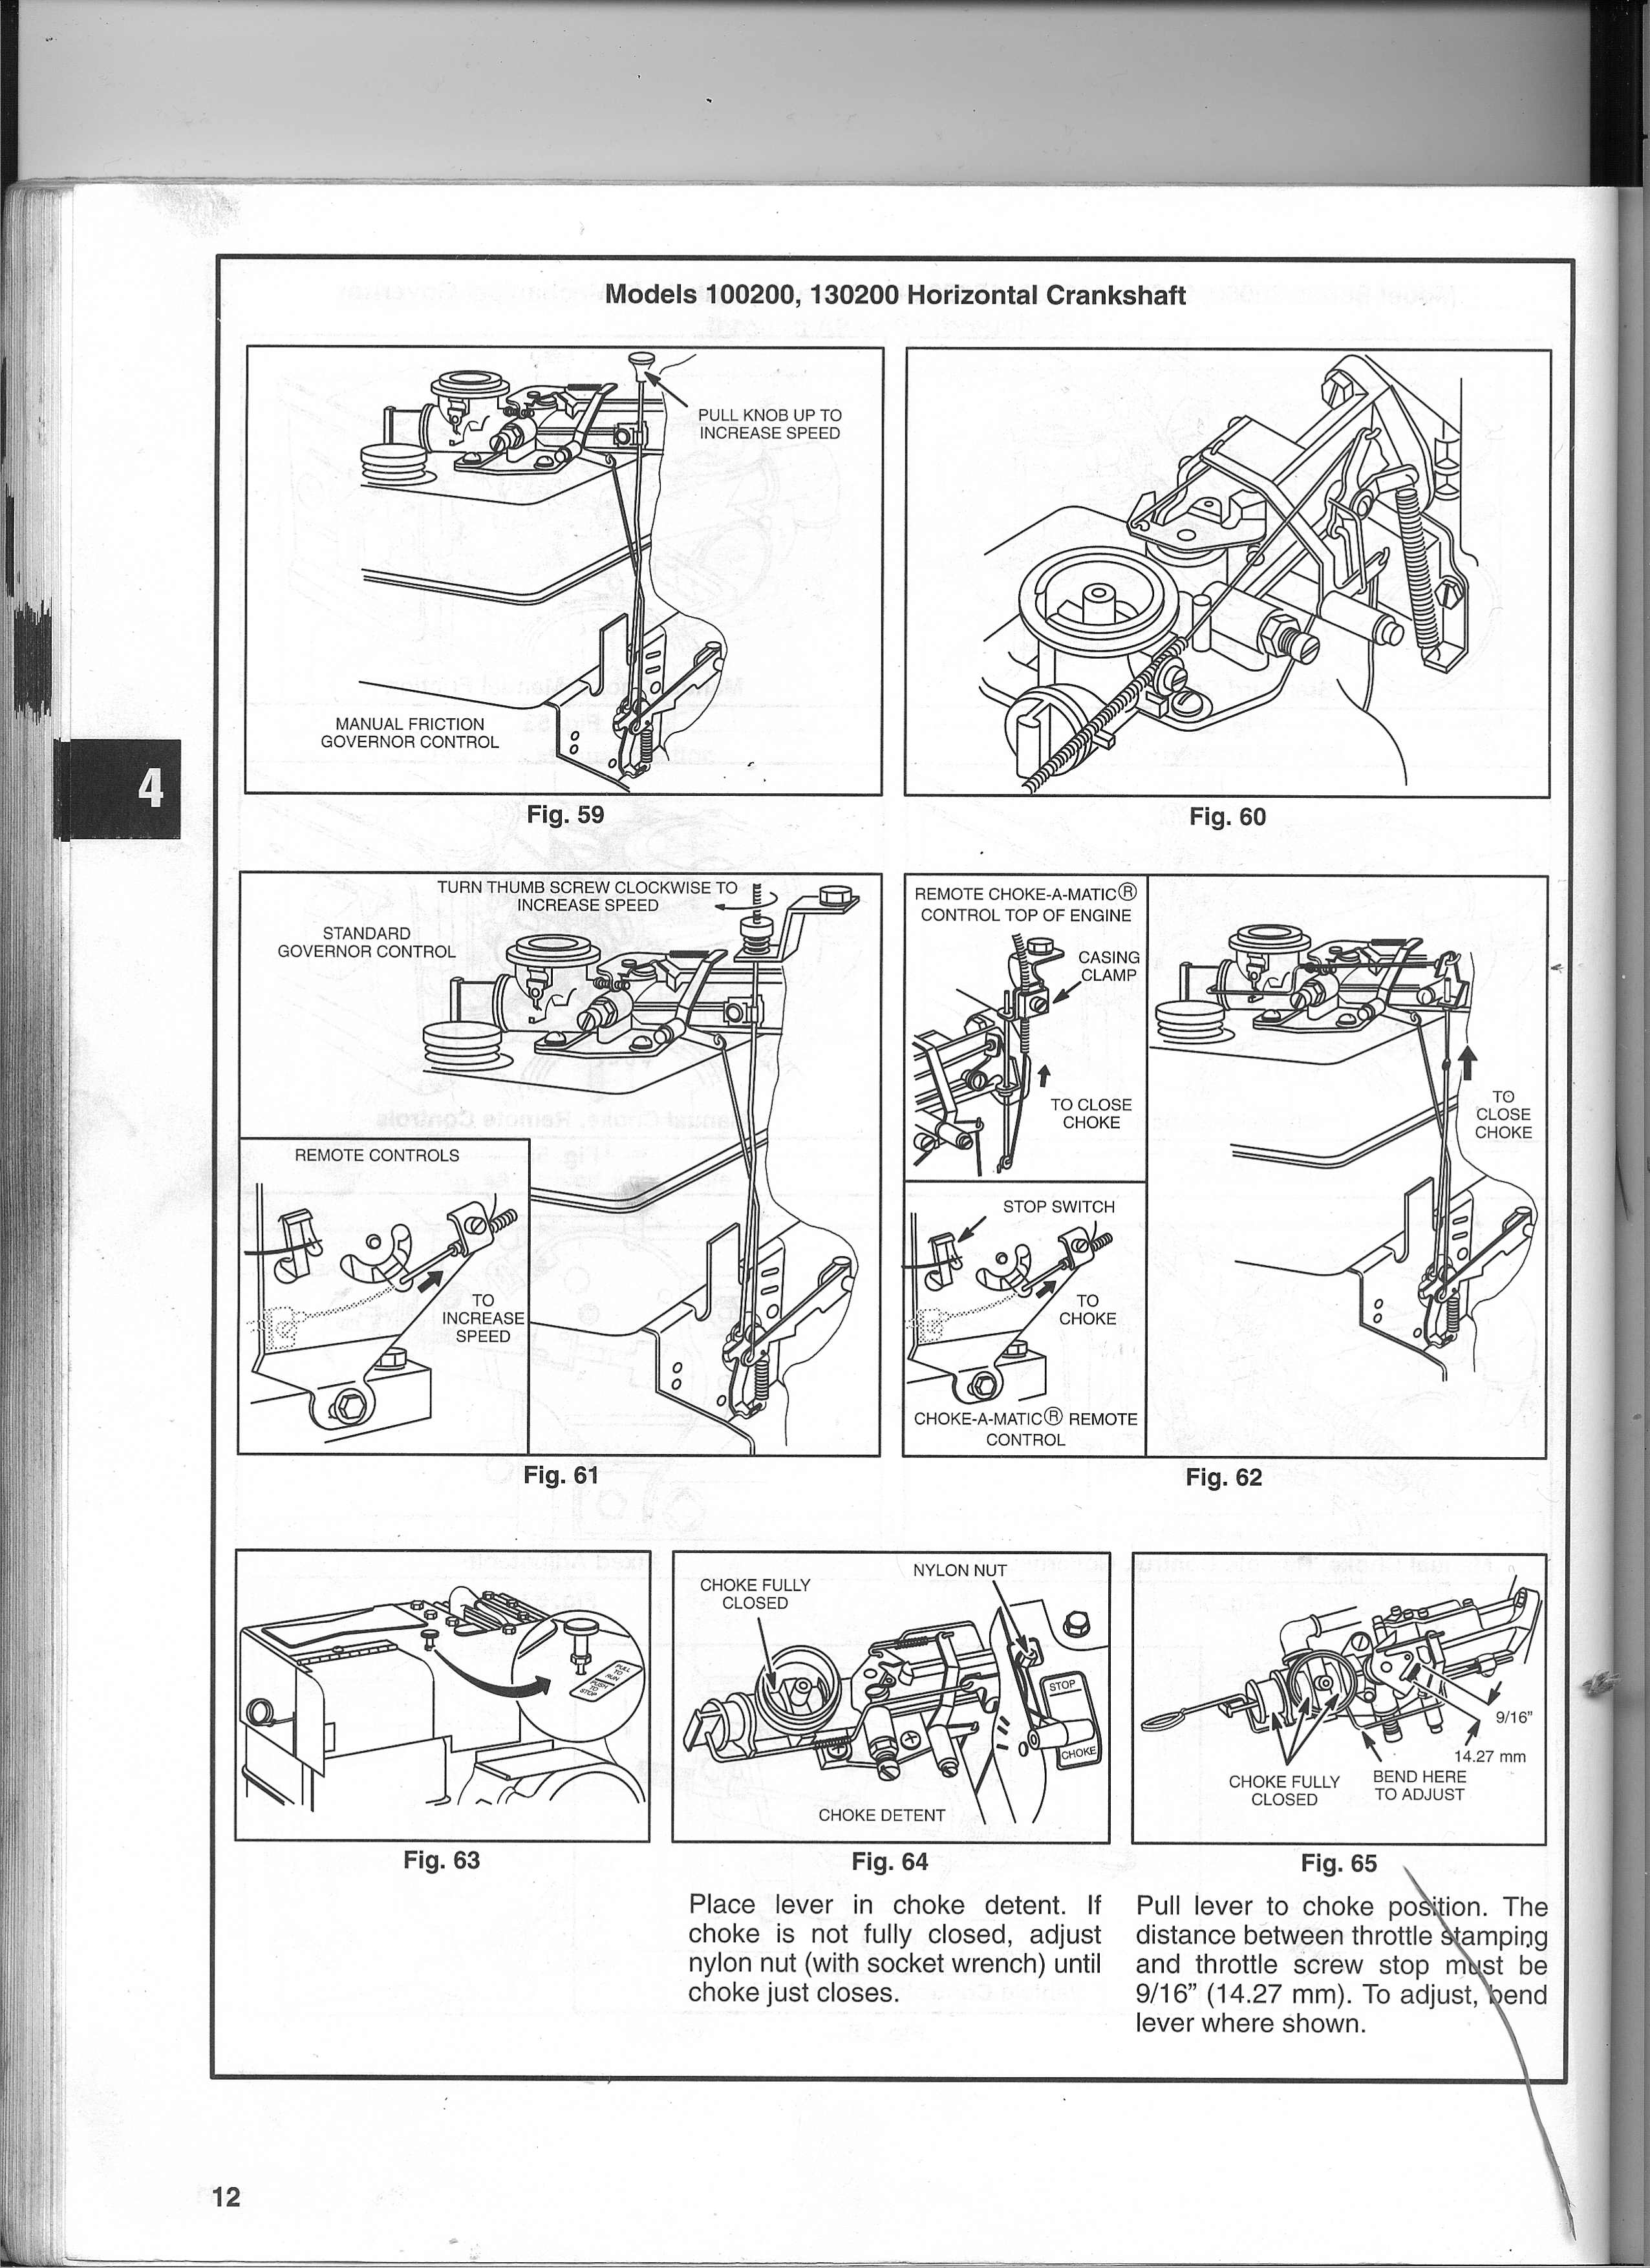 10 Hp Briggs Carburetor Diagram Wiring Schematic Library For And Stratton 11hp Tiller Explore U2022 65 4